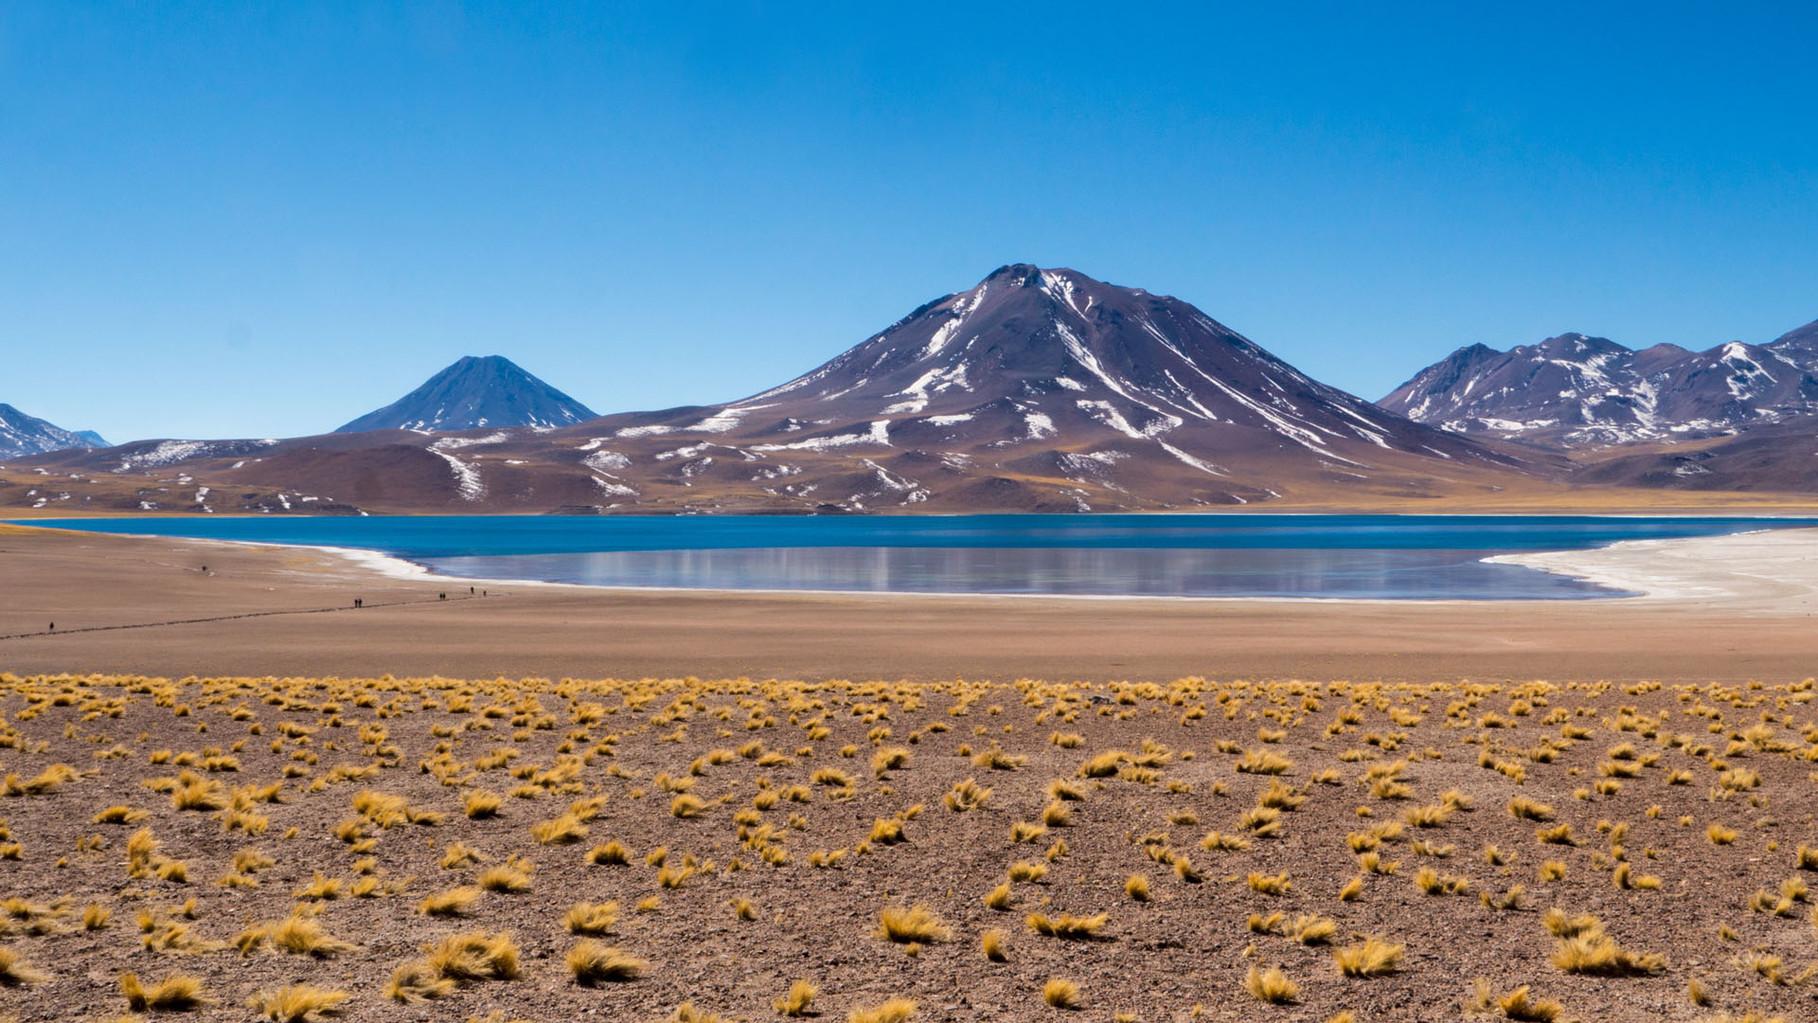 Laguna Miscanti (Reserva Nacional los Flamencos, ca 4200 masl), near San Pedro de Atacama, Chile